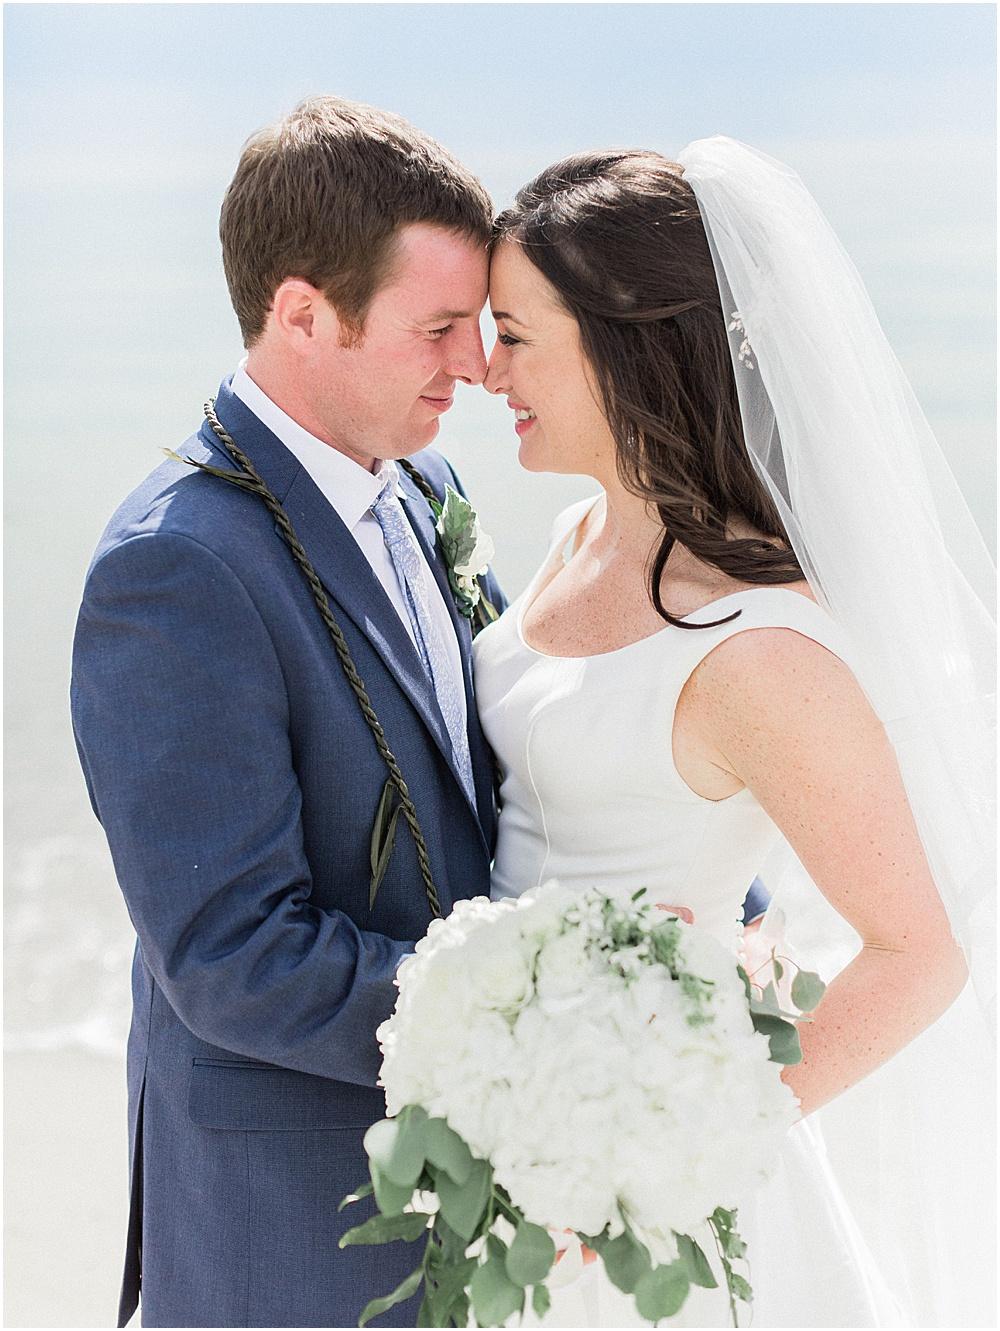 sea_crest_beach_club_st_anthonys_falmouth_old_silver_massachusetts_boston_wedding_photographer_meredith_jane_photography_photo_0410.jpg